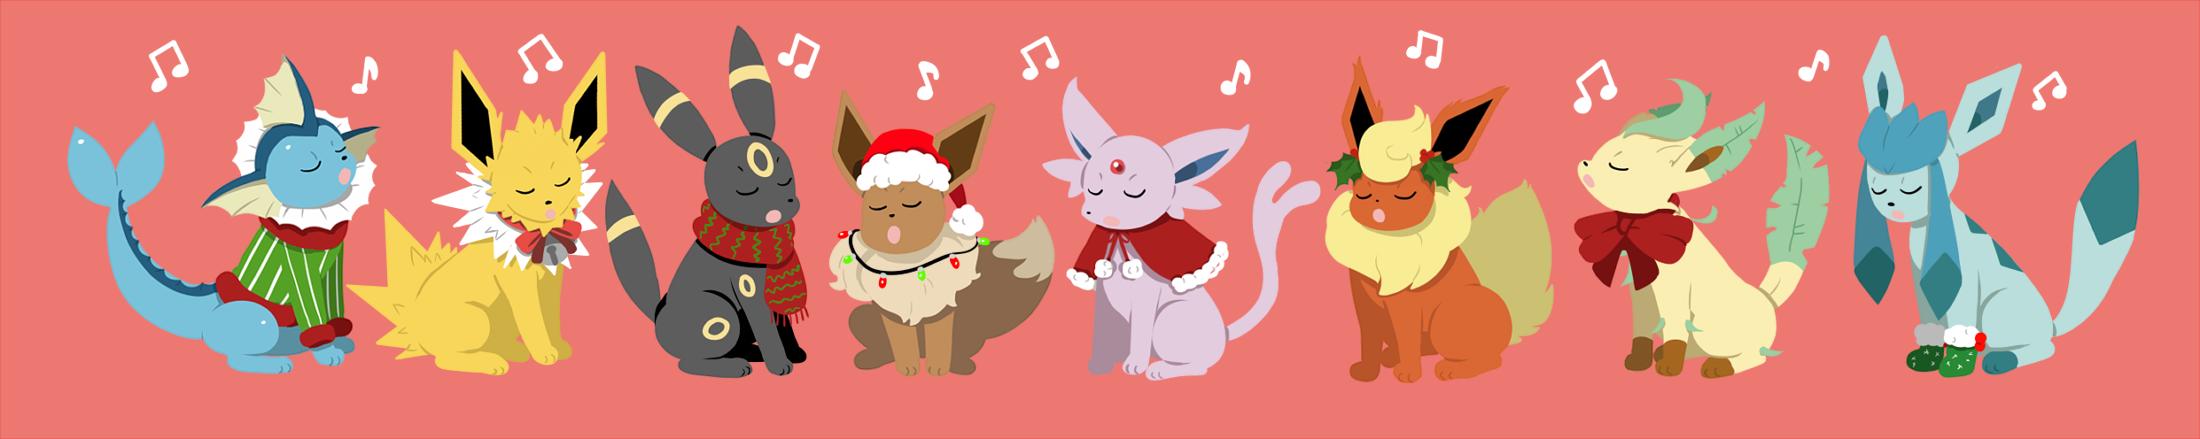 Merry Christmas Eevee by DarkChibiShadow on DeviantArt